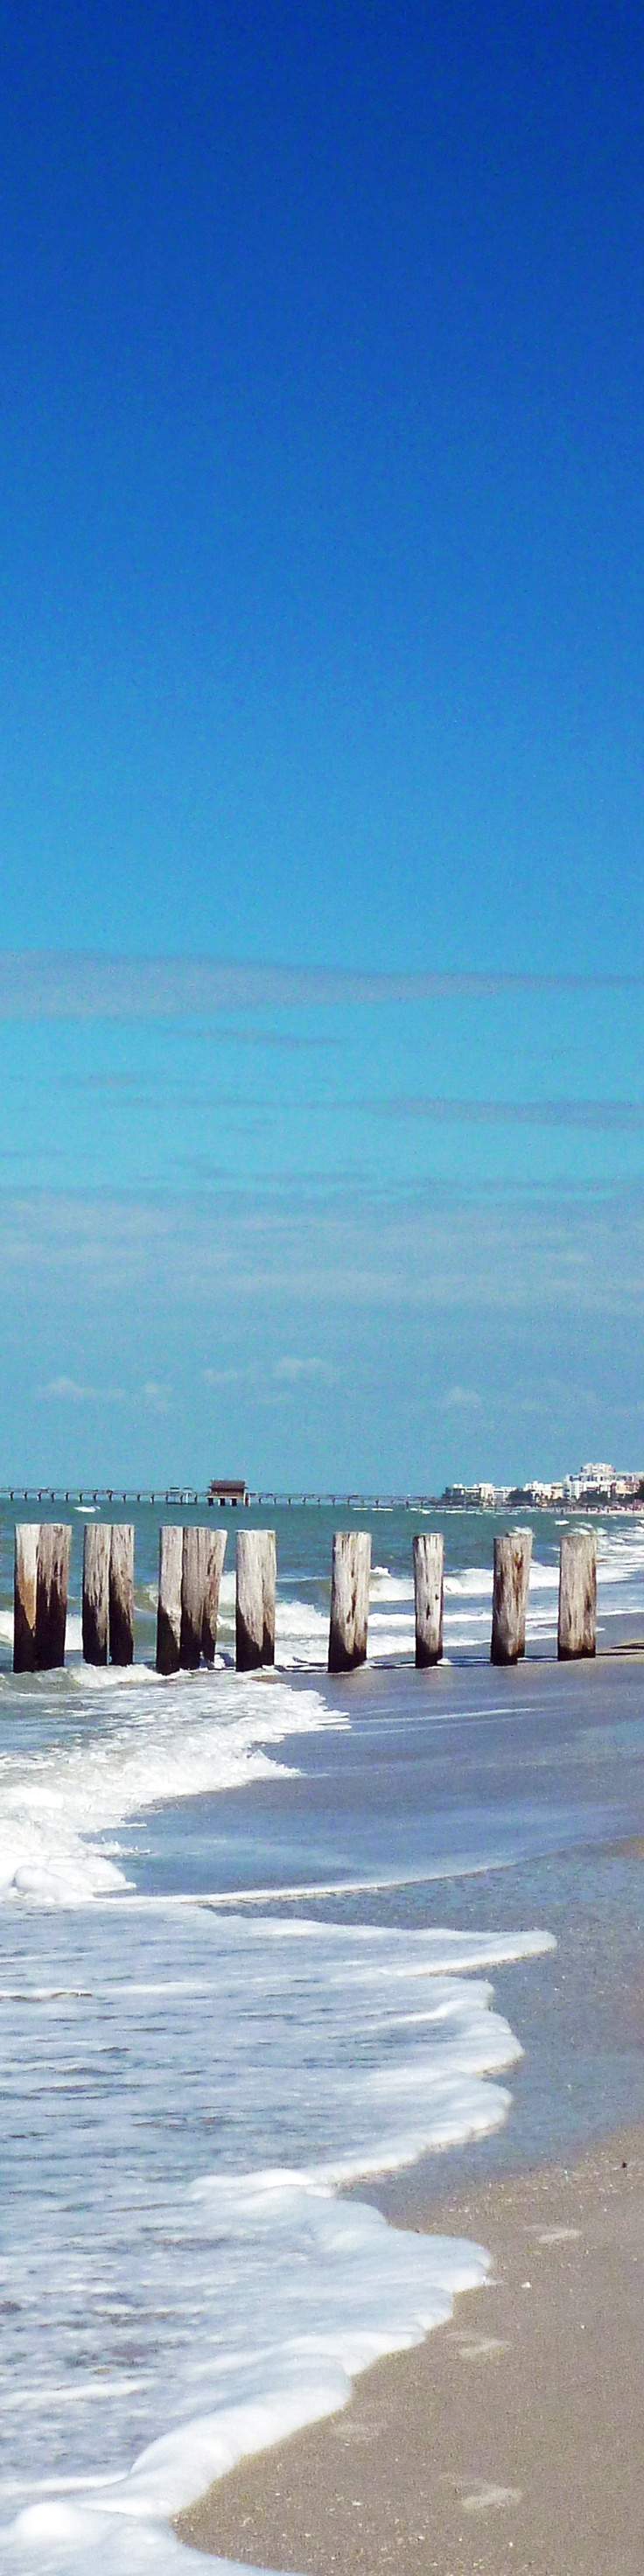 Naples beach #travel #Florida #smileshare